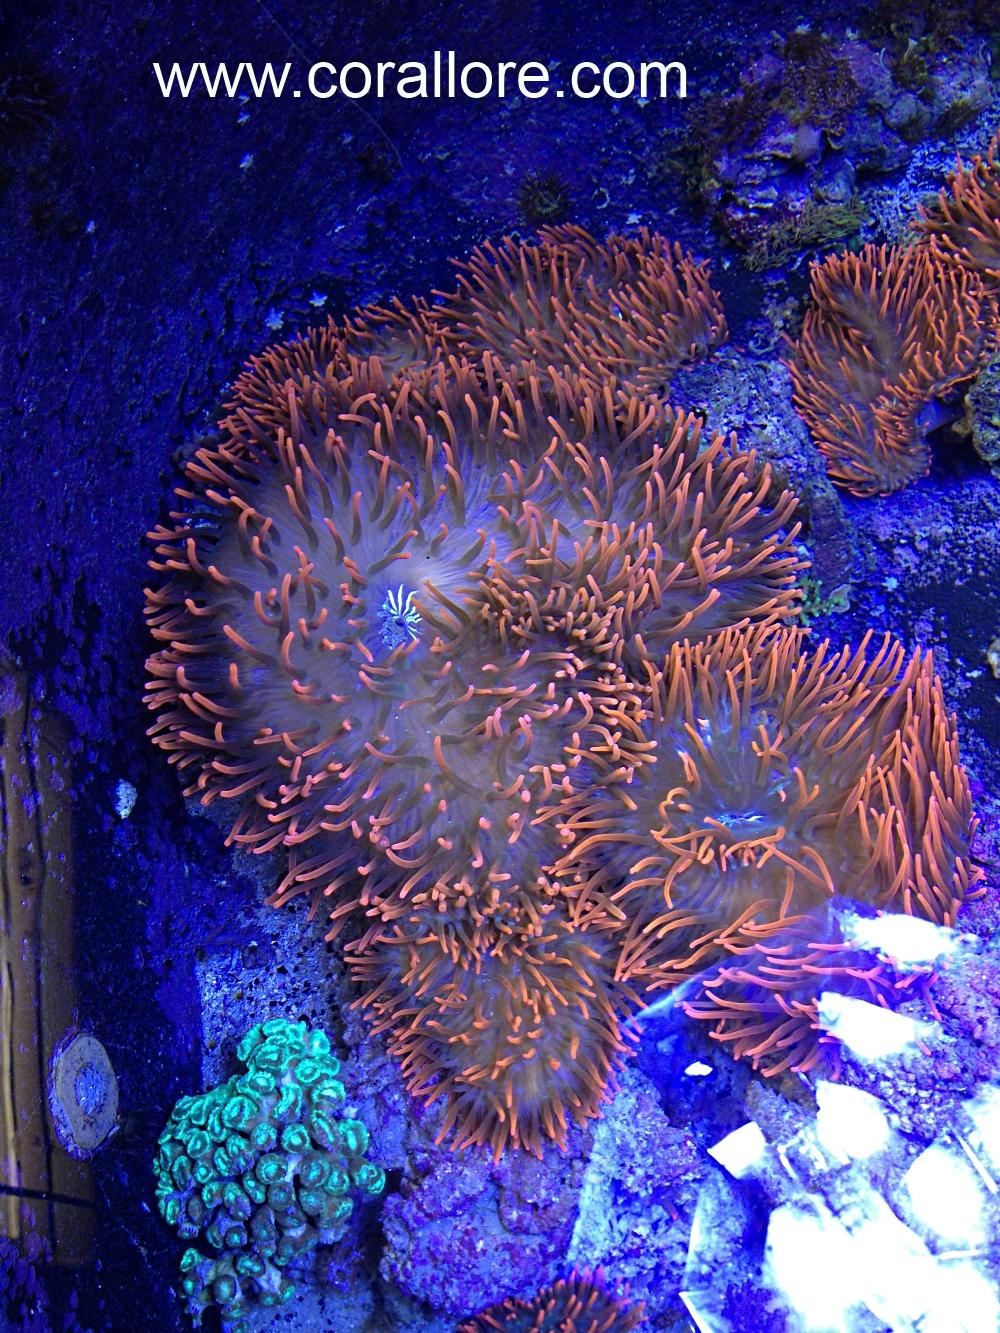 Ananomie Videos anemone shrinking | corallore